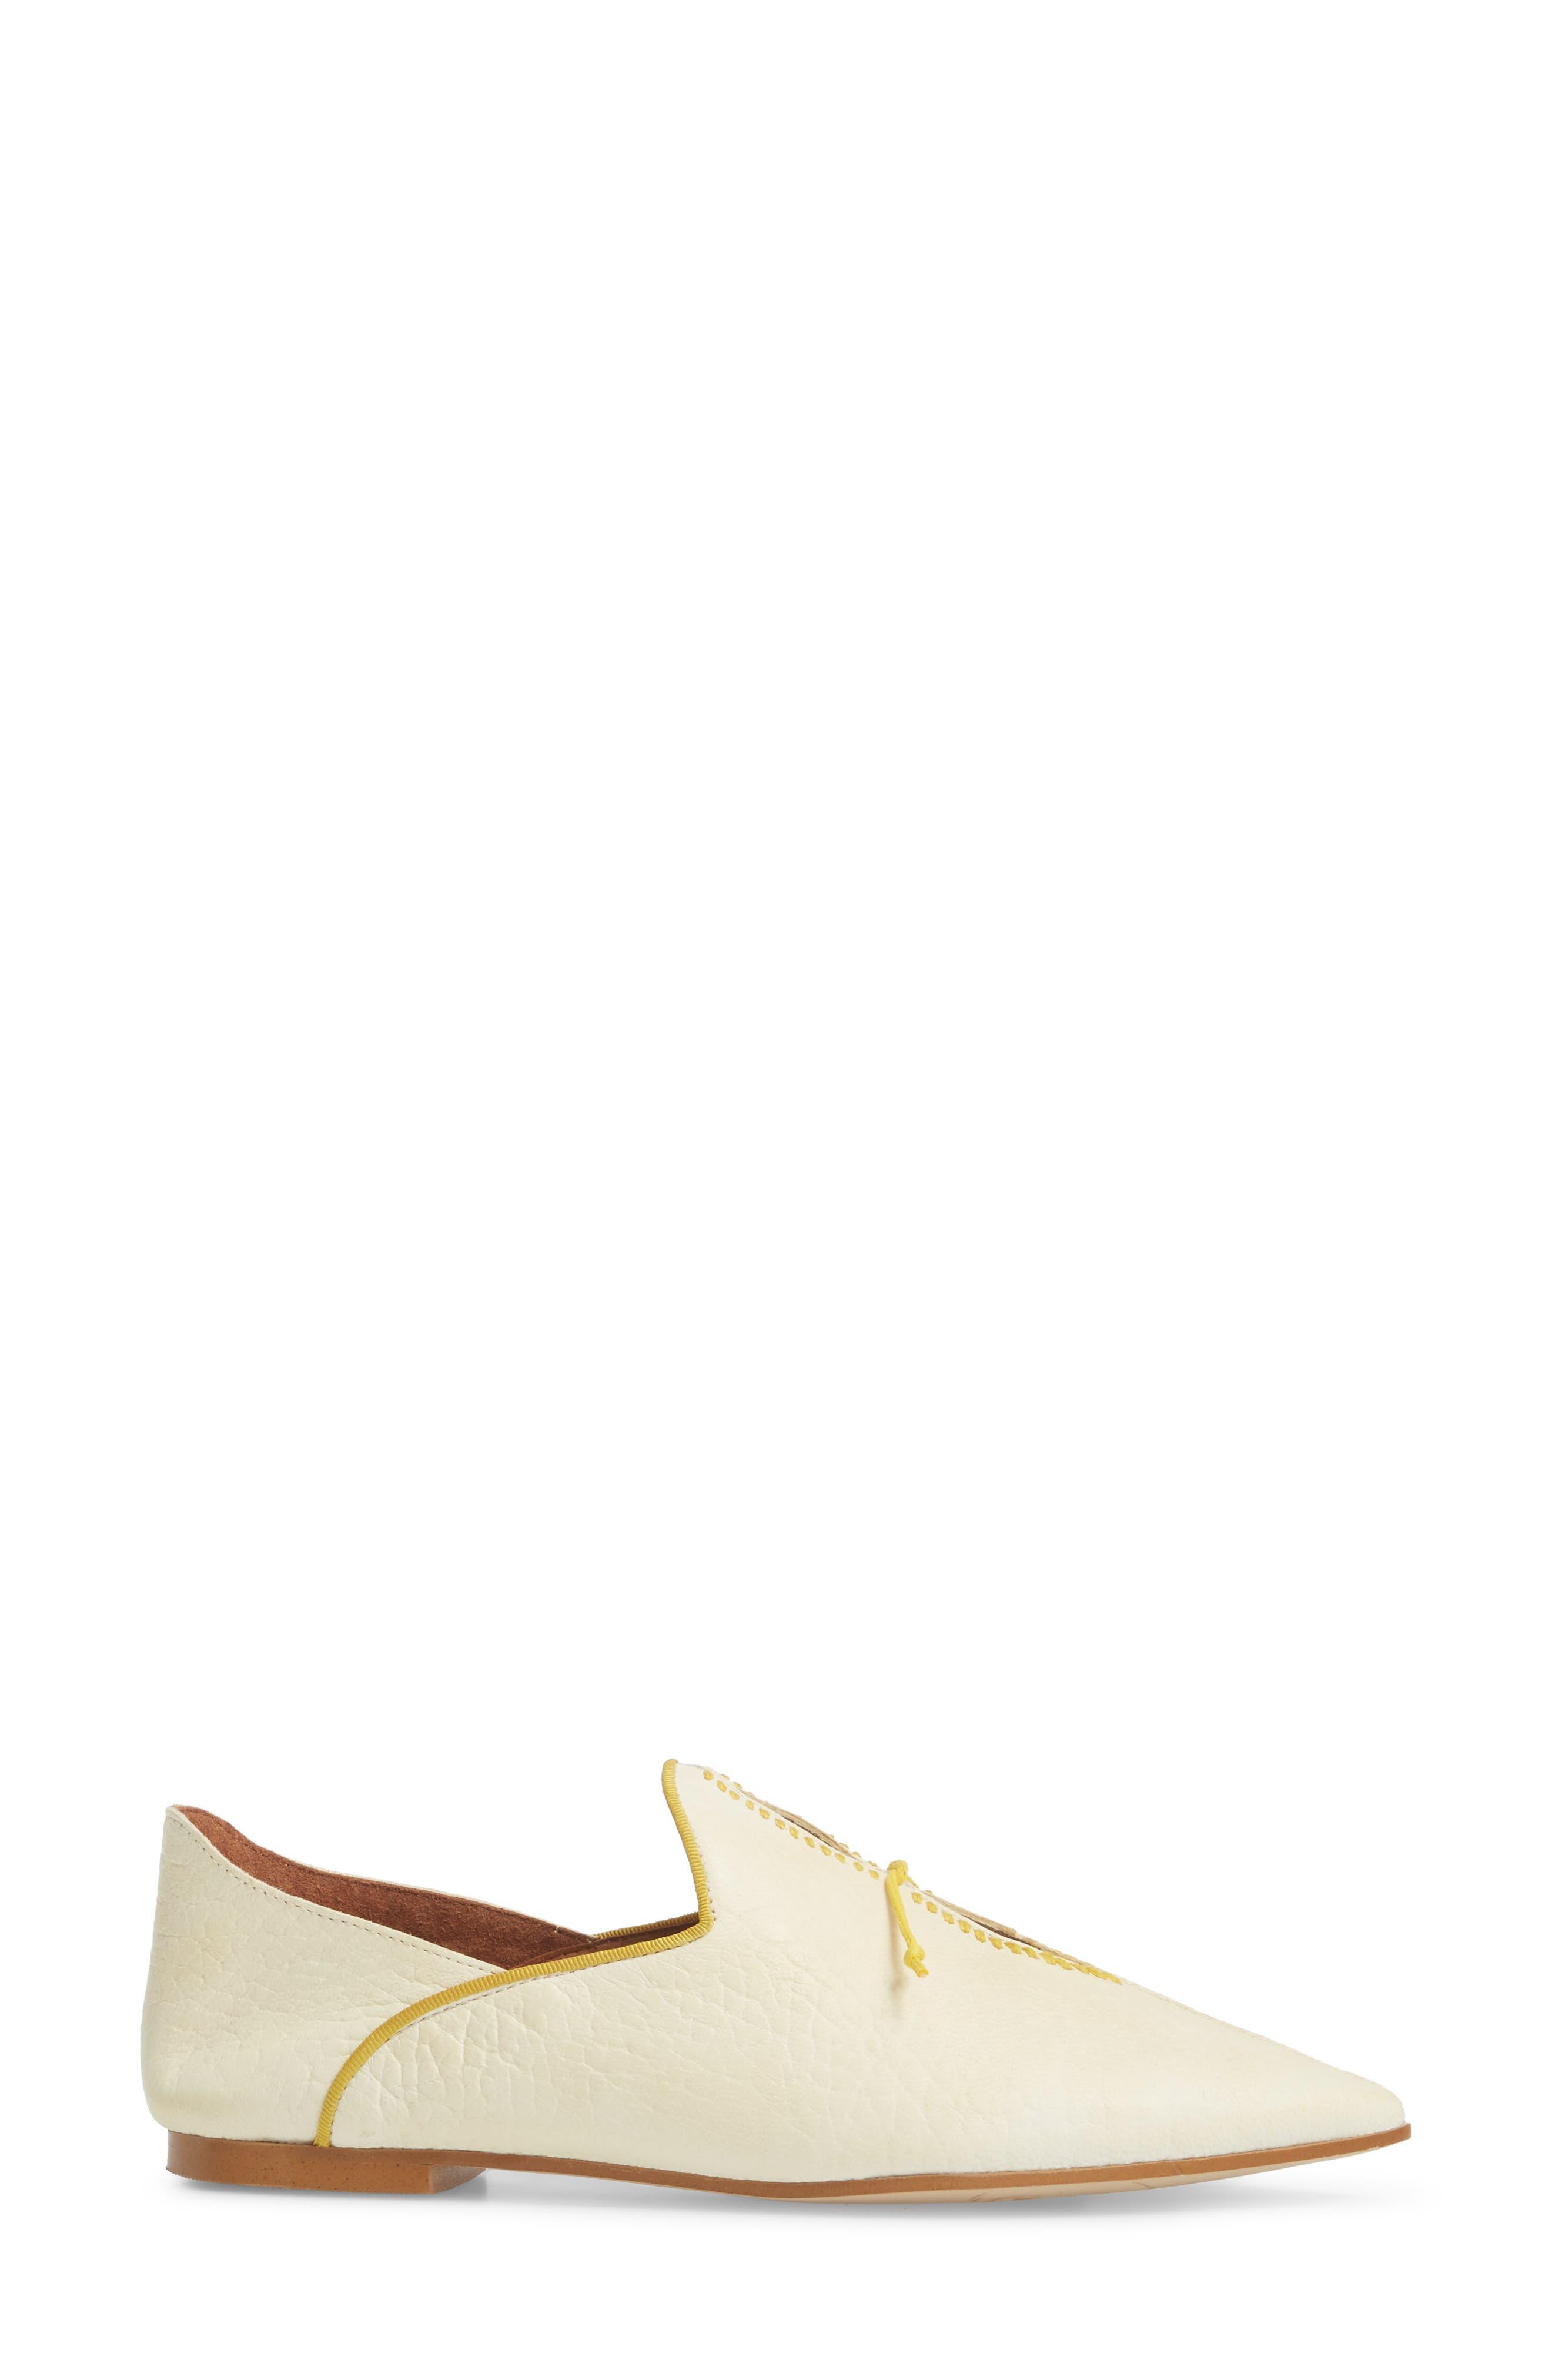 St. Lucia Flat,                             Alternate thumbnail 3, color,                             White